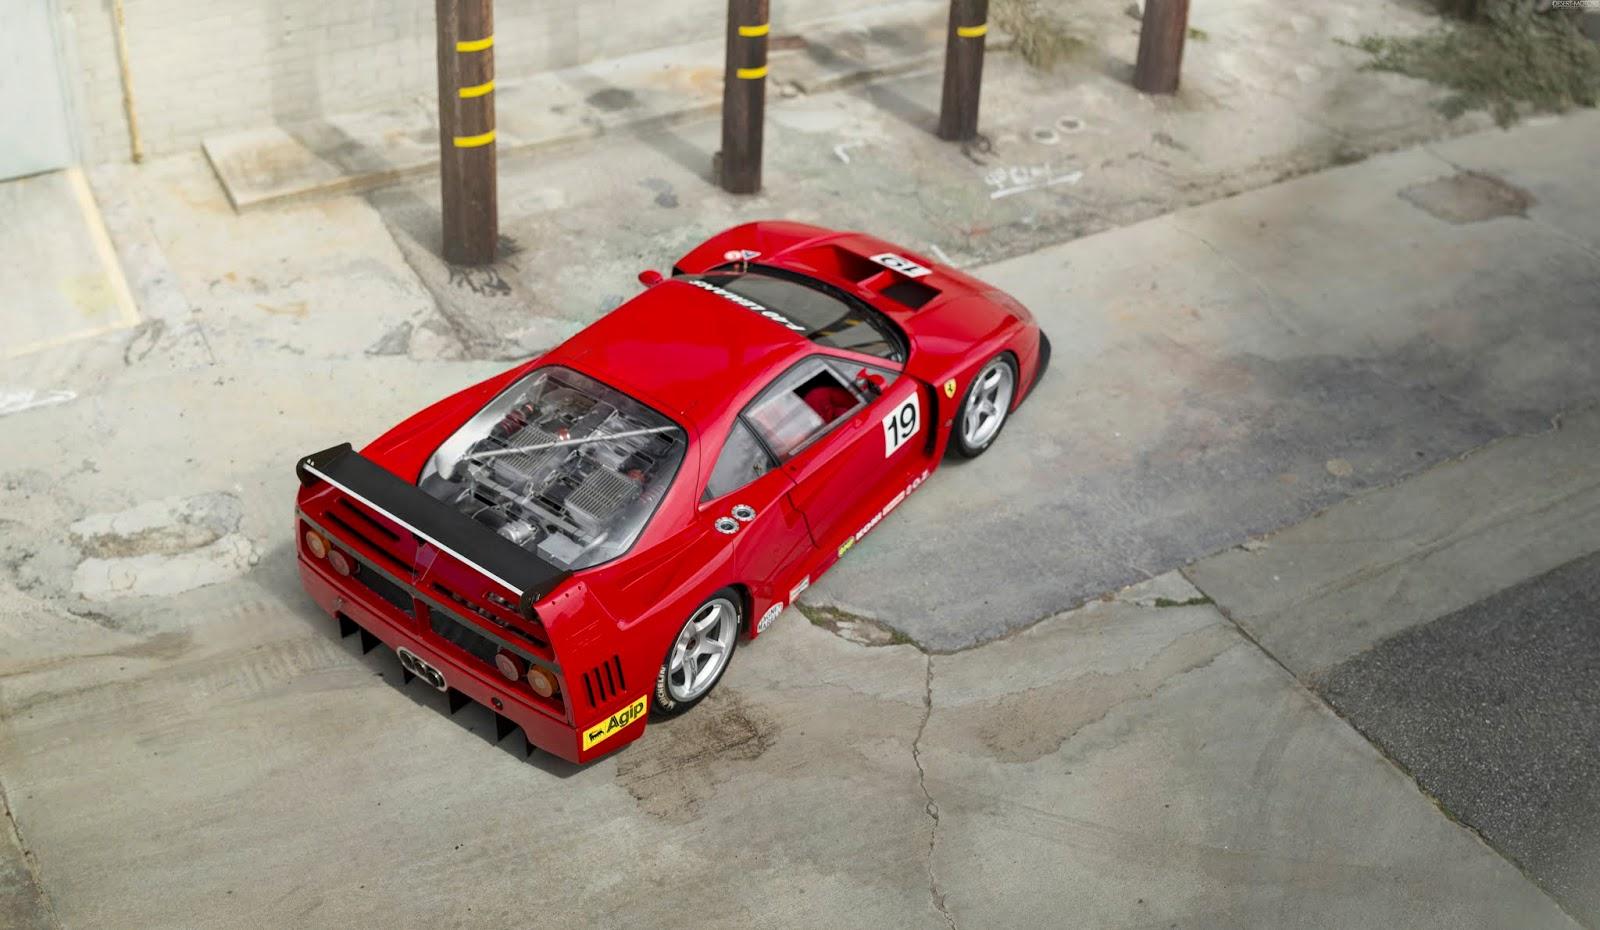 35277624154 d8a96ec591 o F40. O μύθος, ο θρύλος F40, Ferrari, Ferrari F40, retrocar, retrocar sunday, zblog